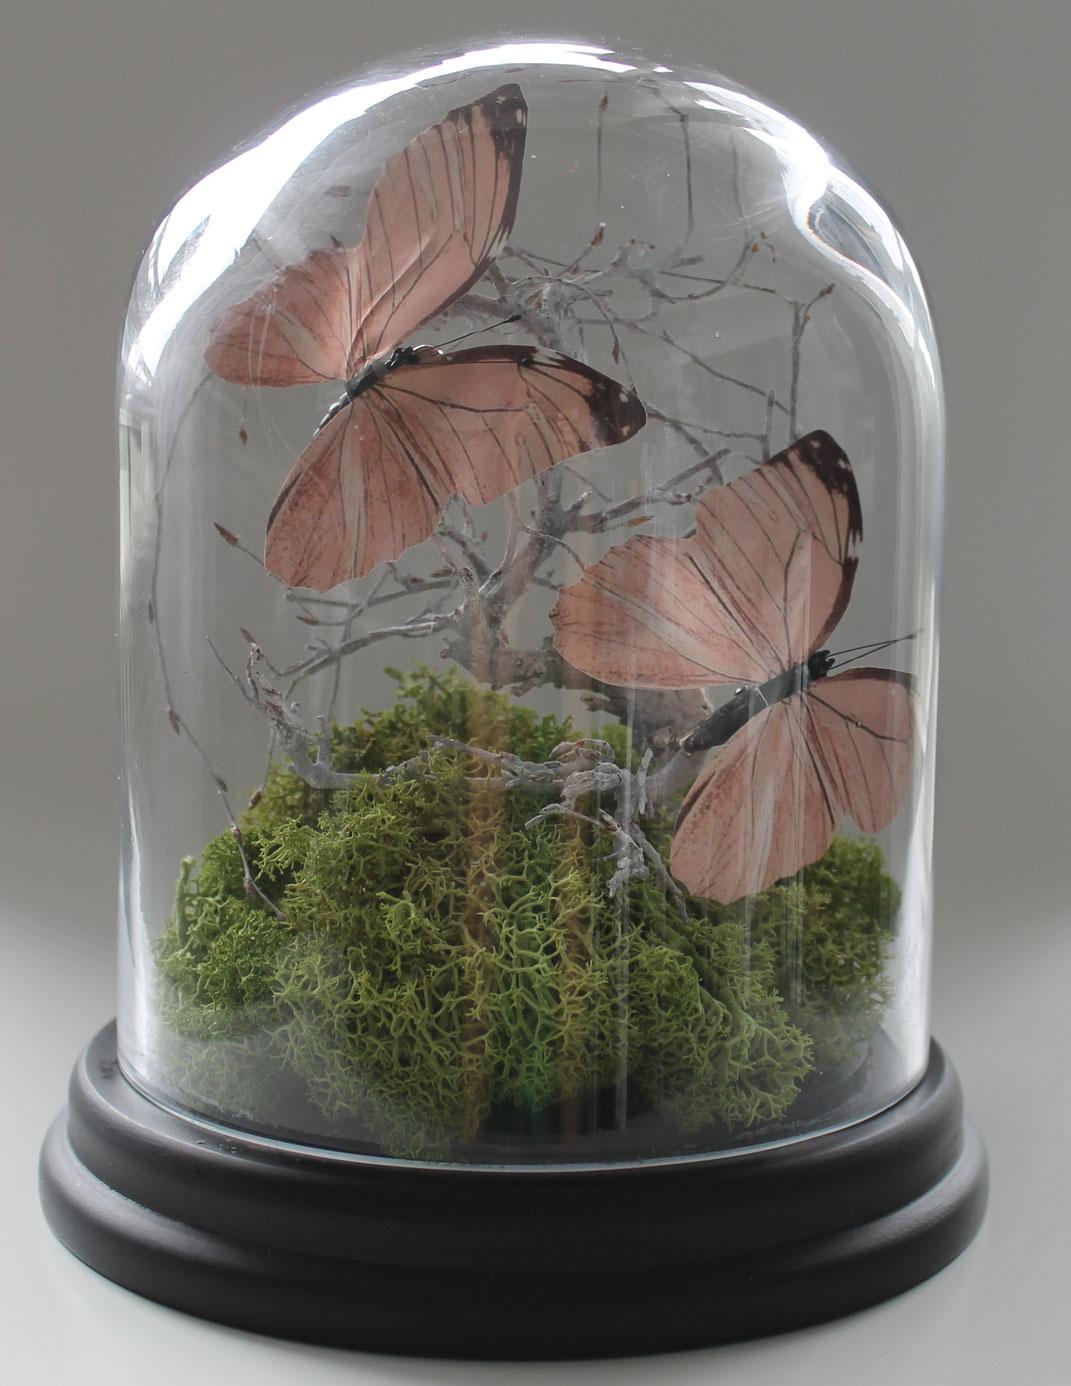 under the bell jar